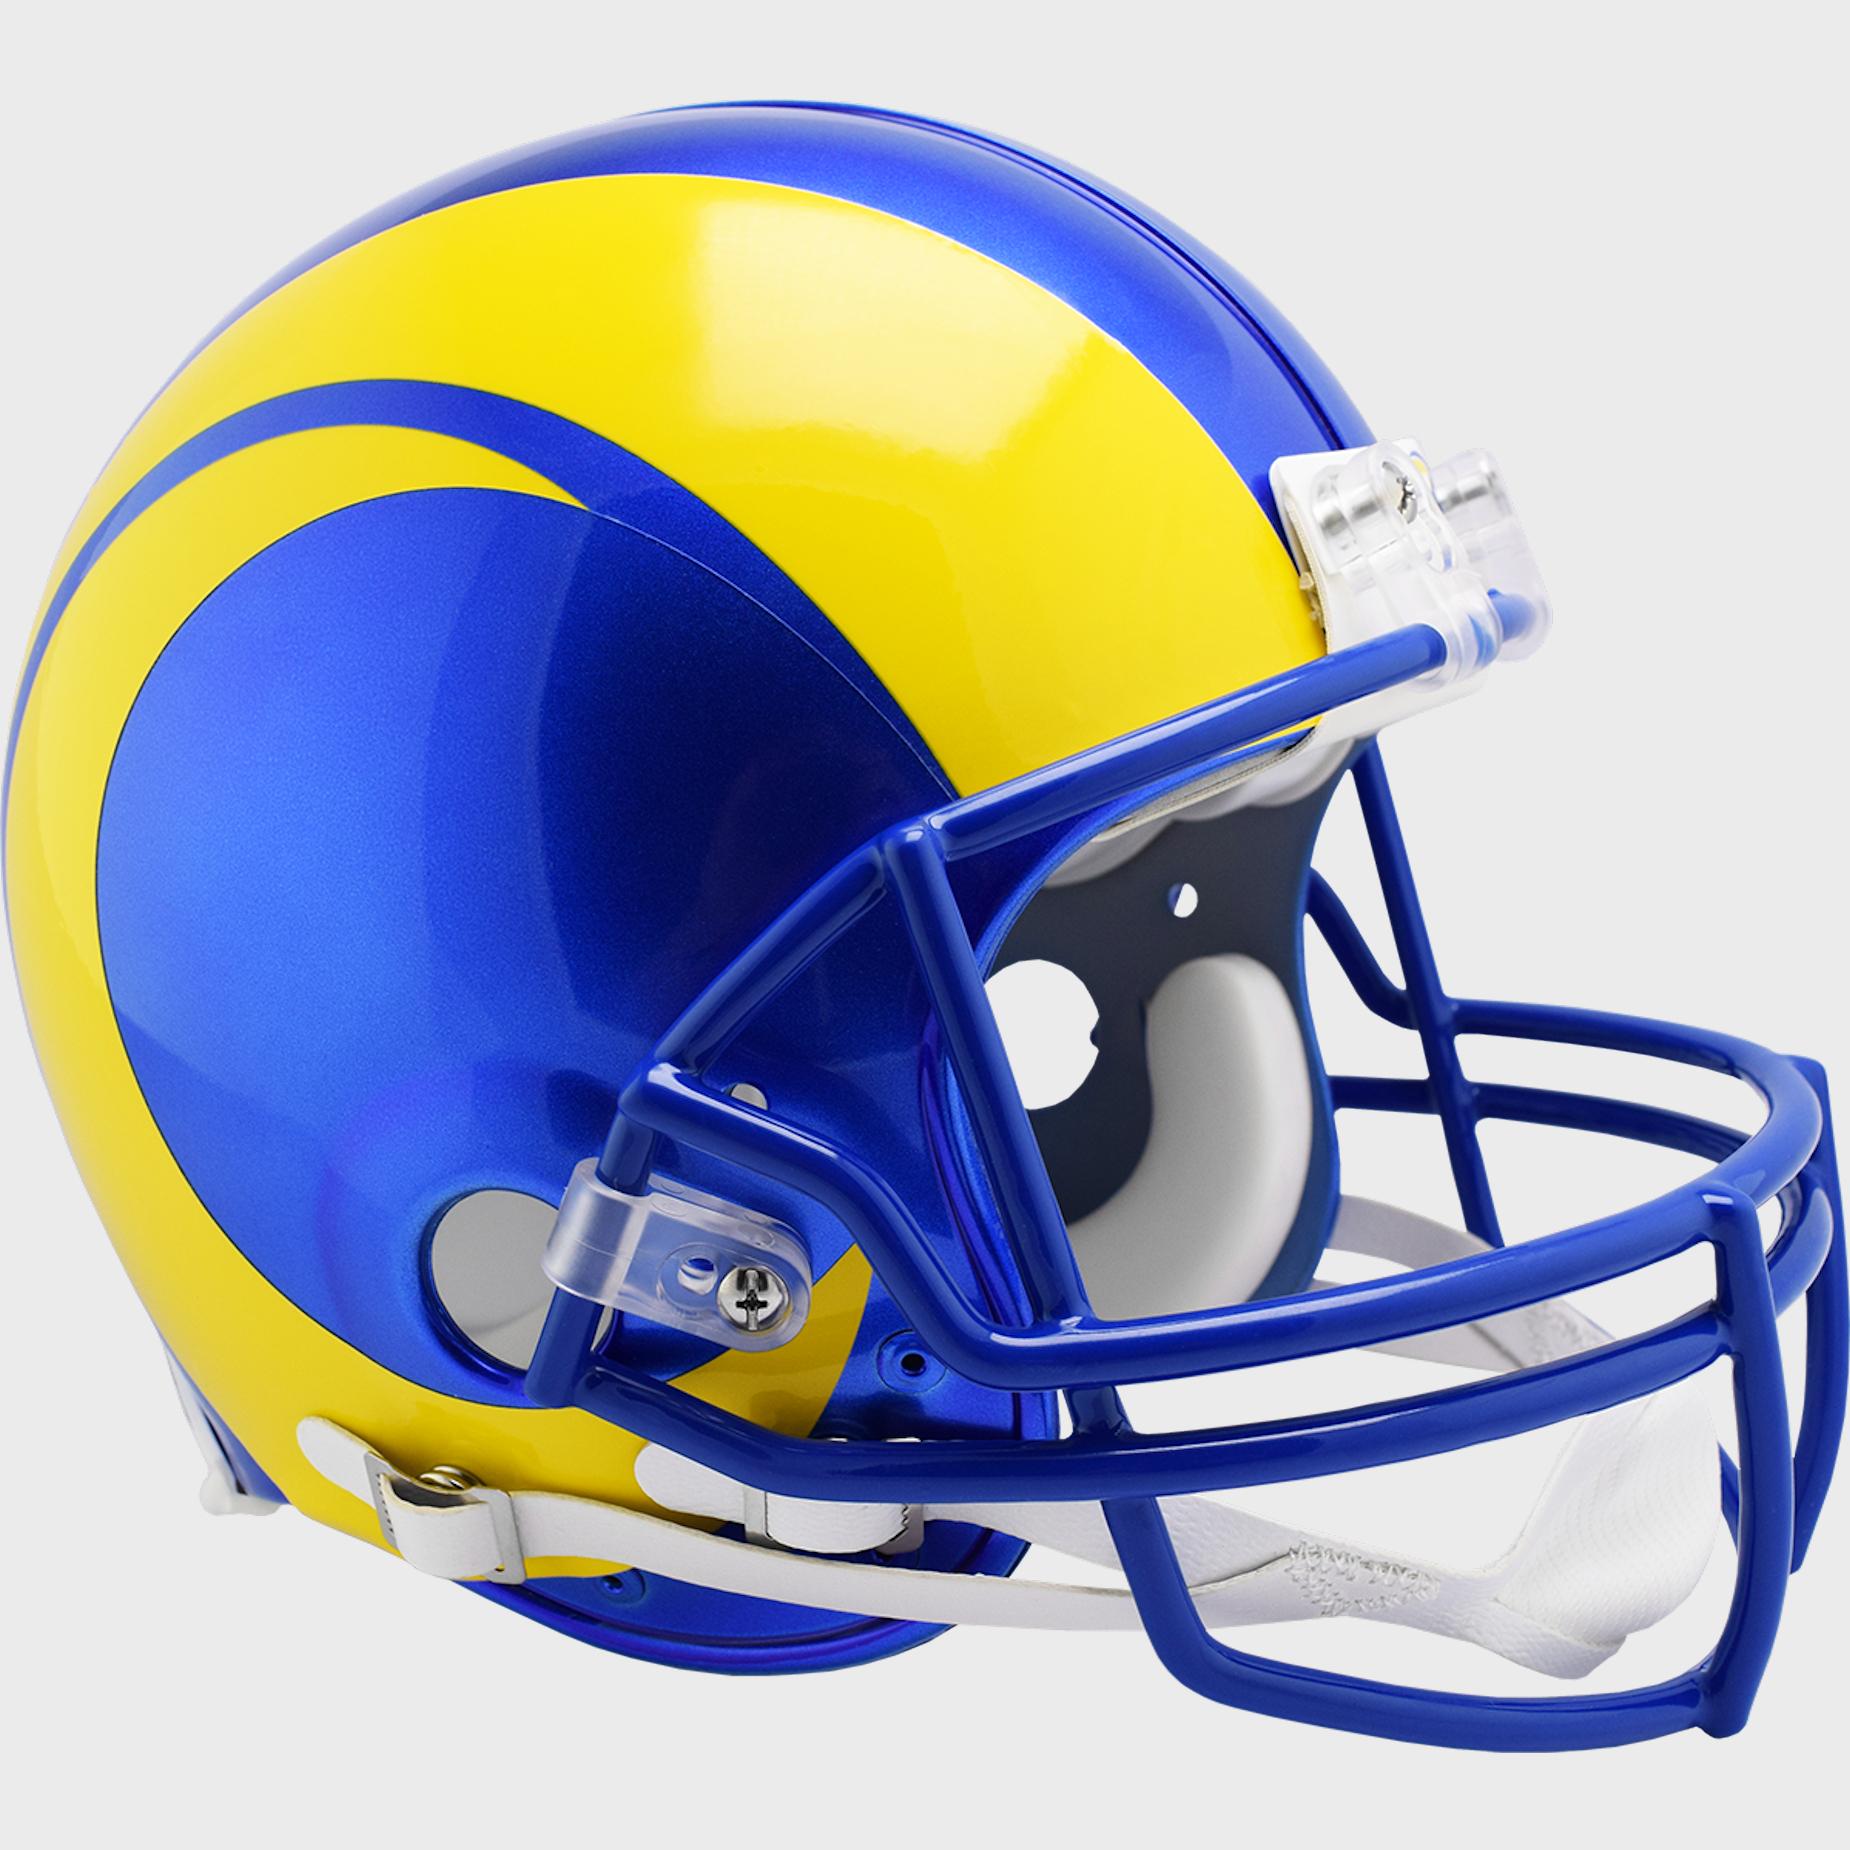 Los Angeles Rams Football Helmet <B>NEW 2020</B>